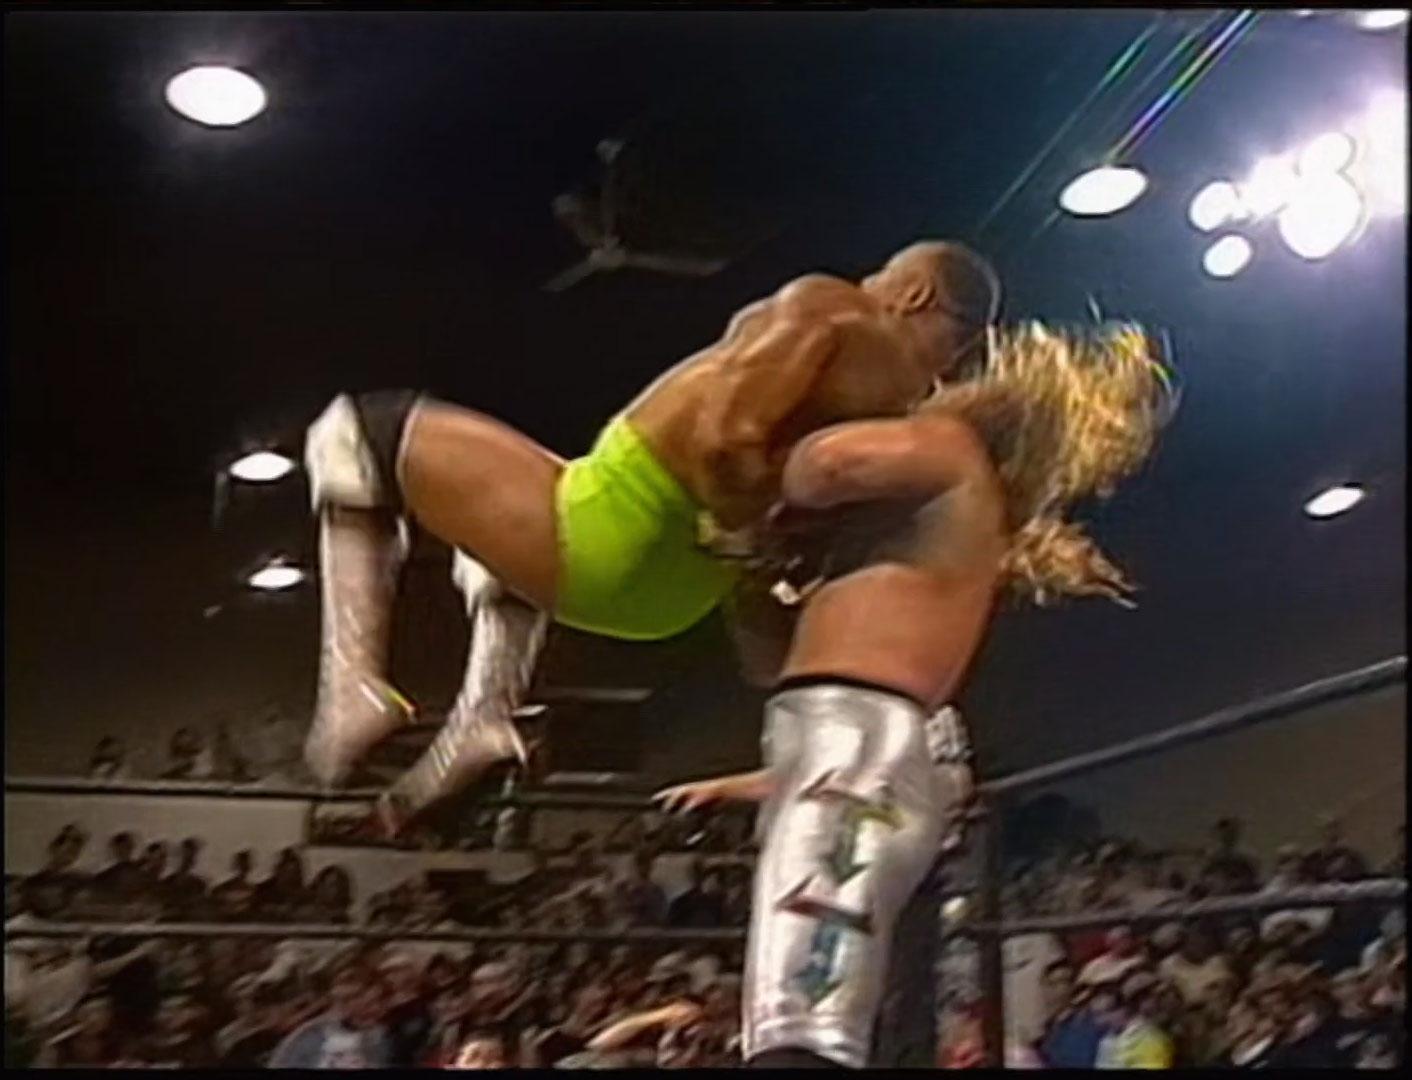 Chris Jericho vs Too Cold Scorpio vs Pitbull 2 vs Shane Douglas ECW Television Championship ECW Hardcore TV July 23rd 1996